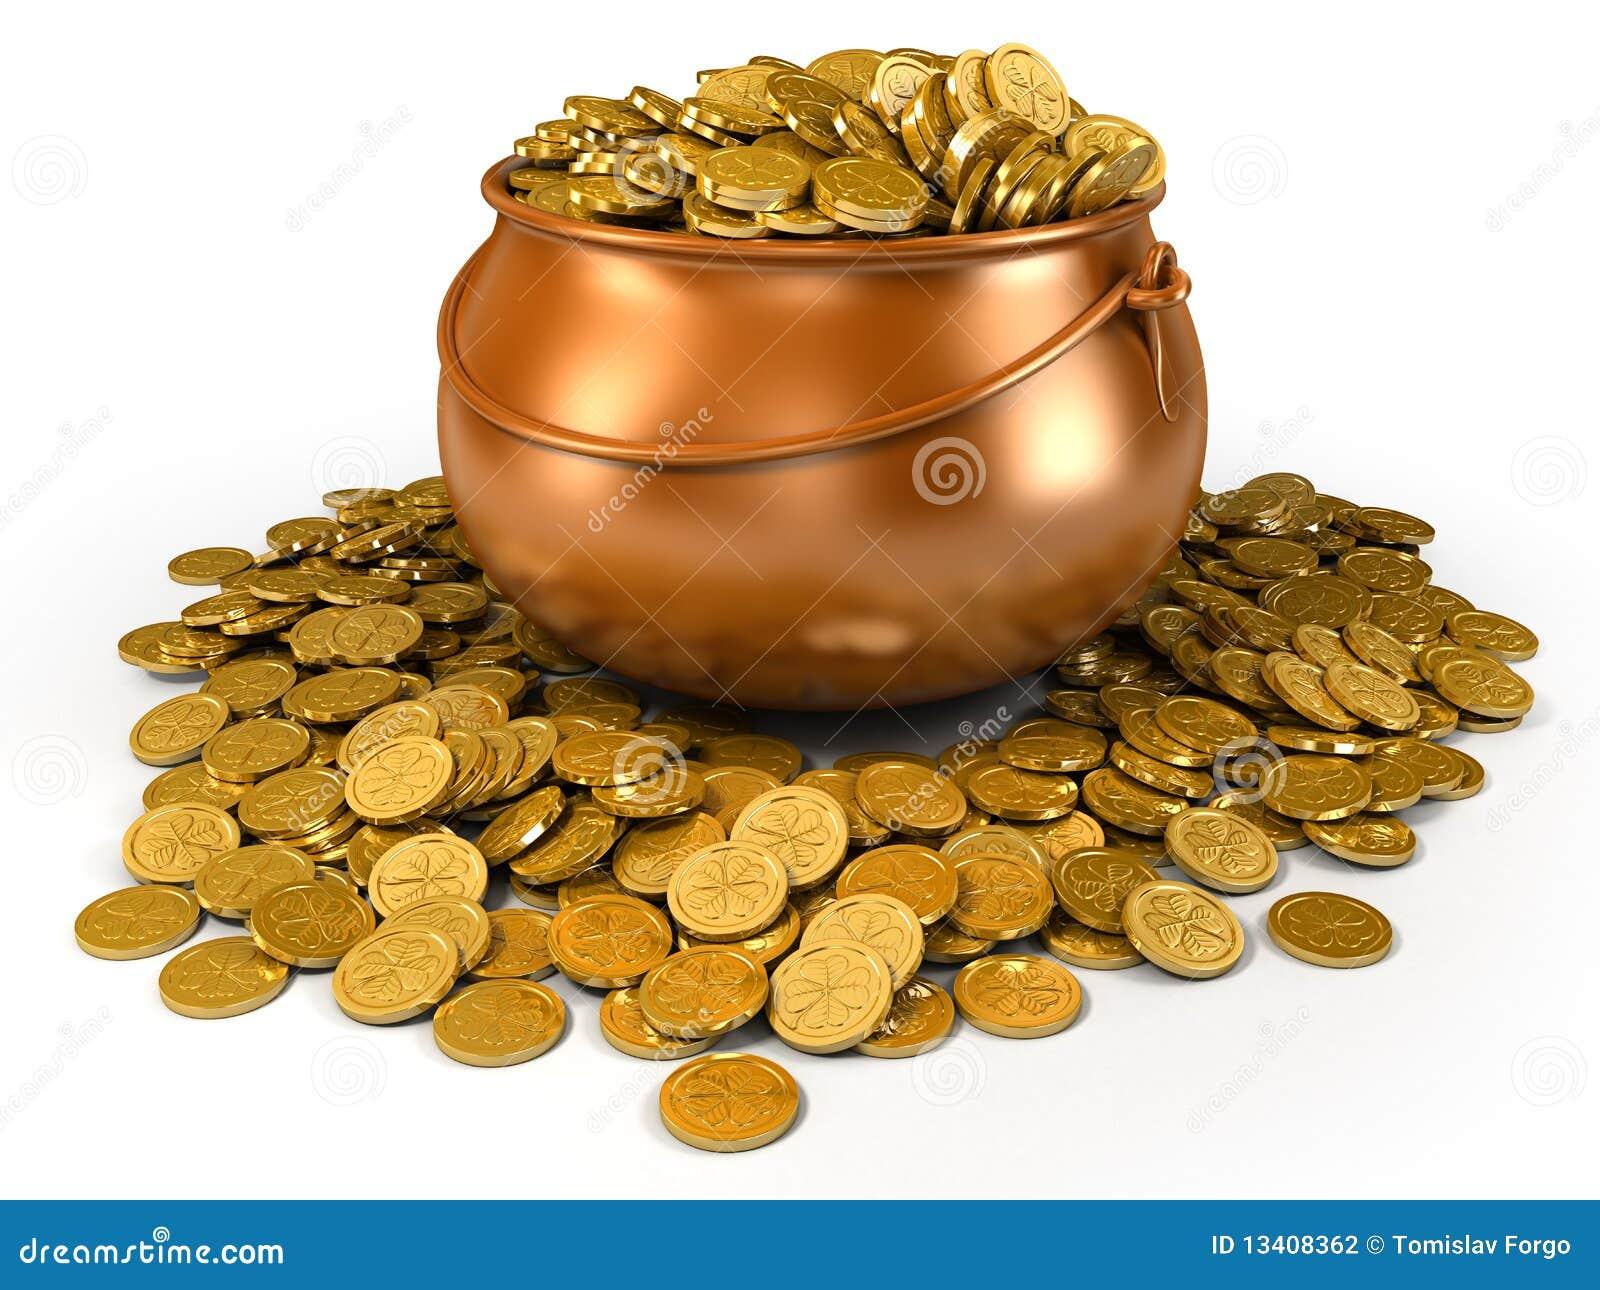 Crisol Por Completo De Monedas De Oro